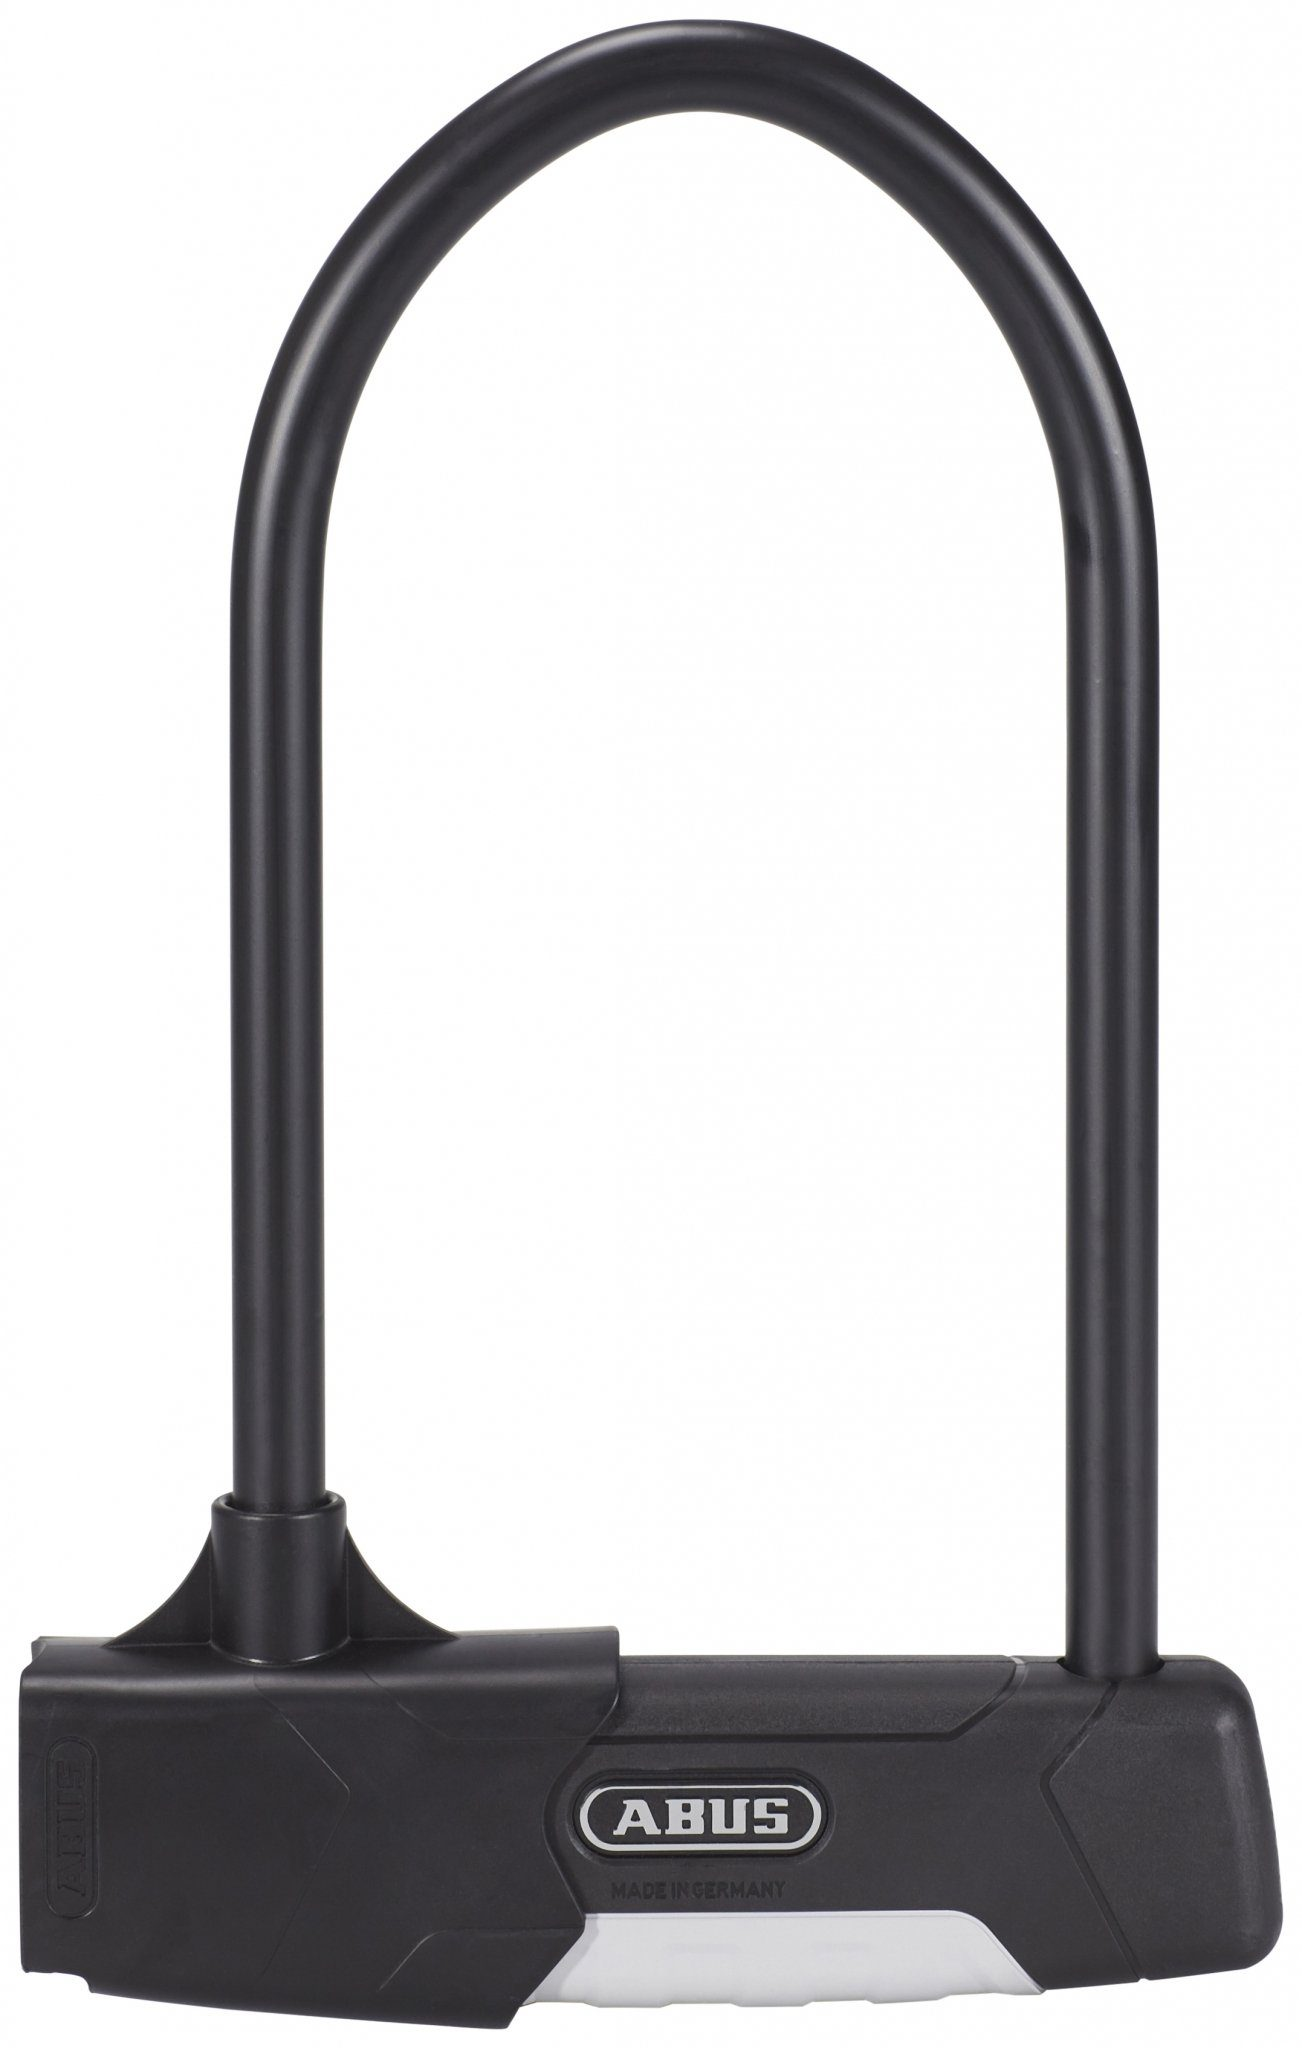 ABUS Fahrradschloss »Granit Plus 470 Bügelschloss 230mm USH 470«